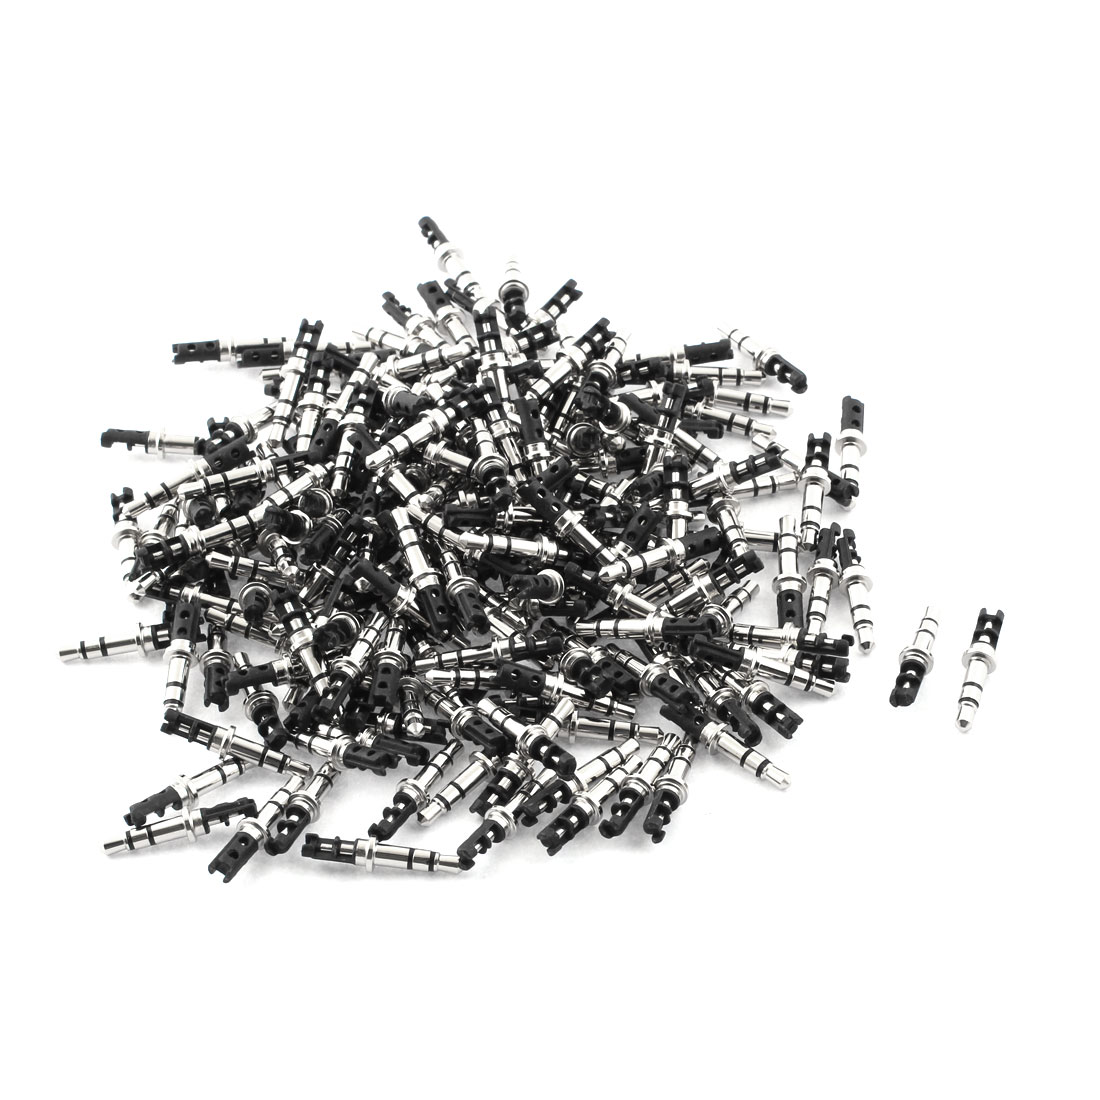 medium resolution of unique bargains 3 5mm stereo male plug repair audio headphone jack solder connector black 200pcs walmart canada